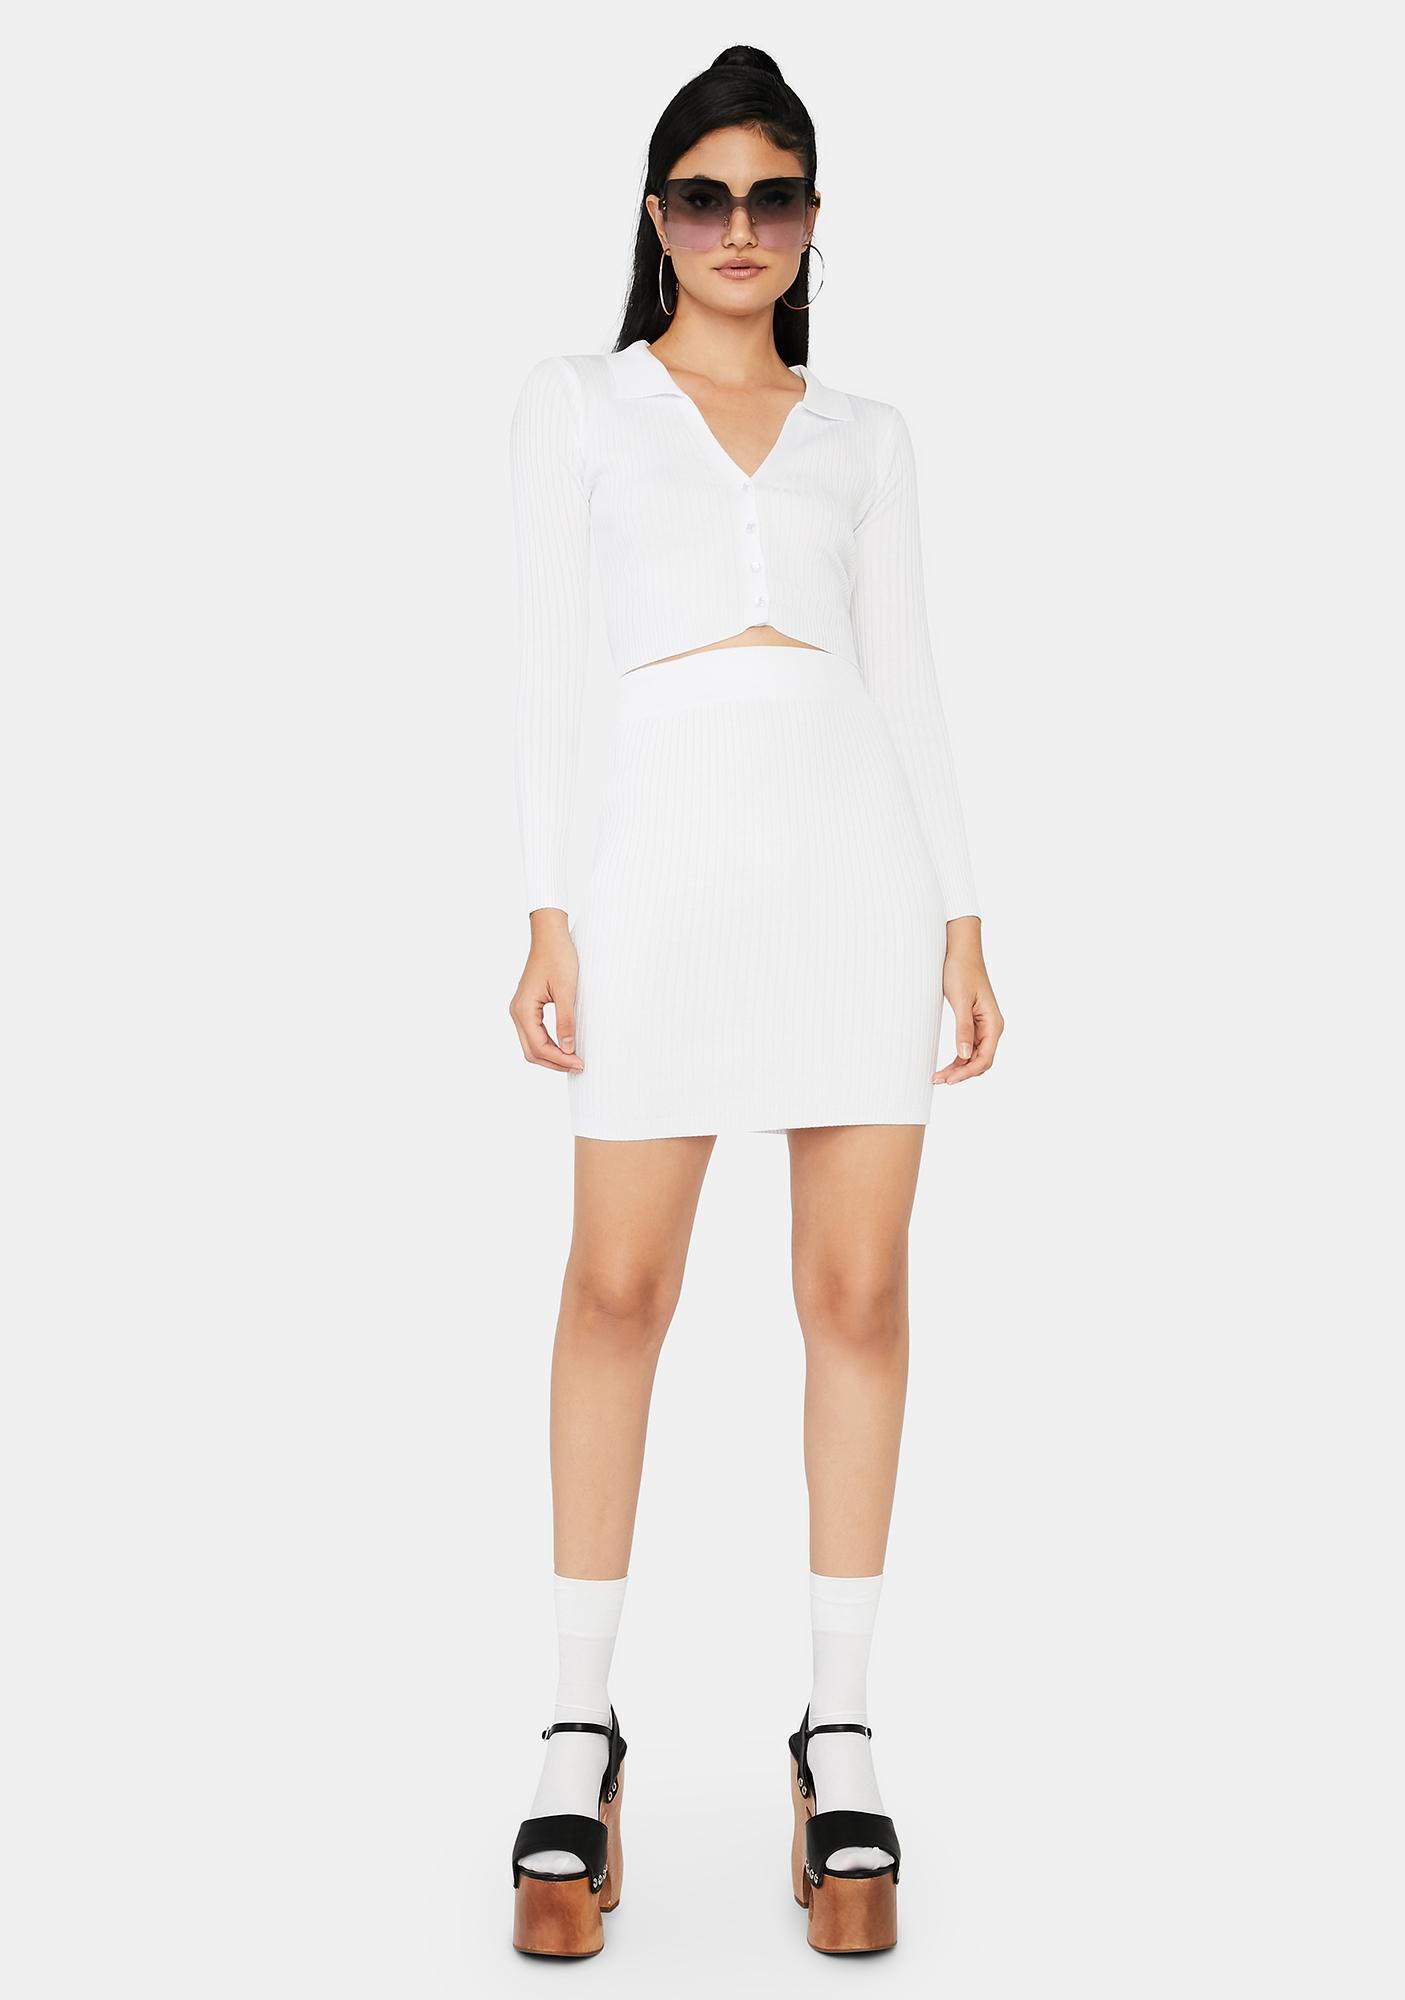 Angel Off Duty Cutie Skirt Set